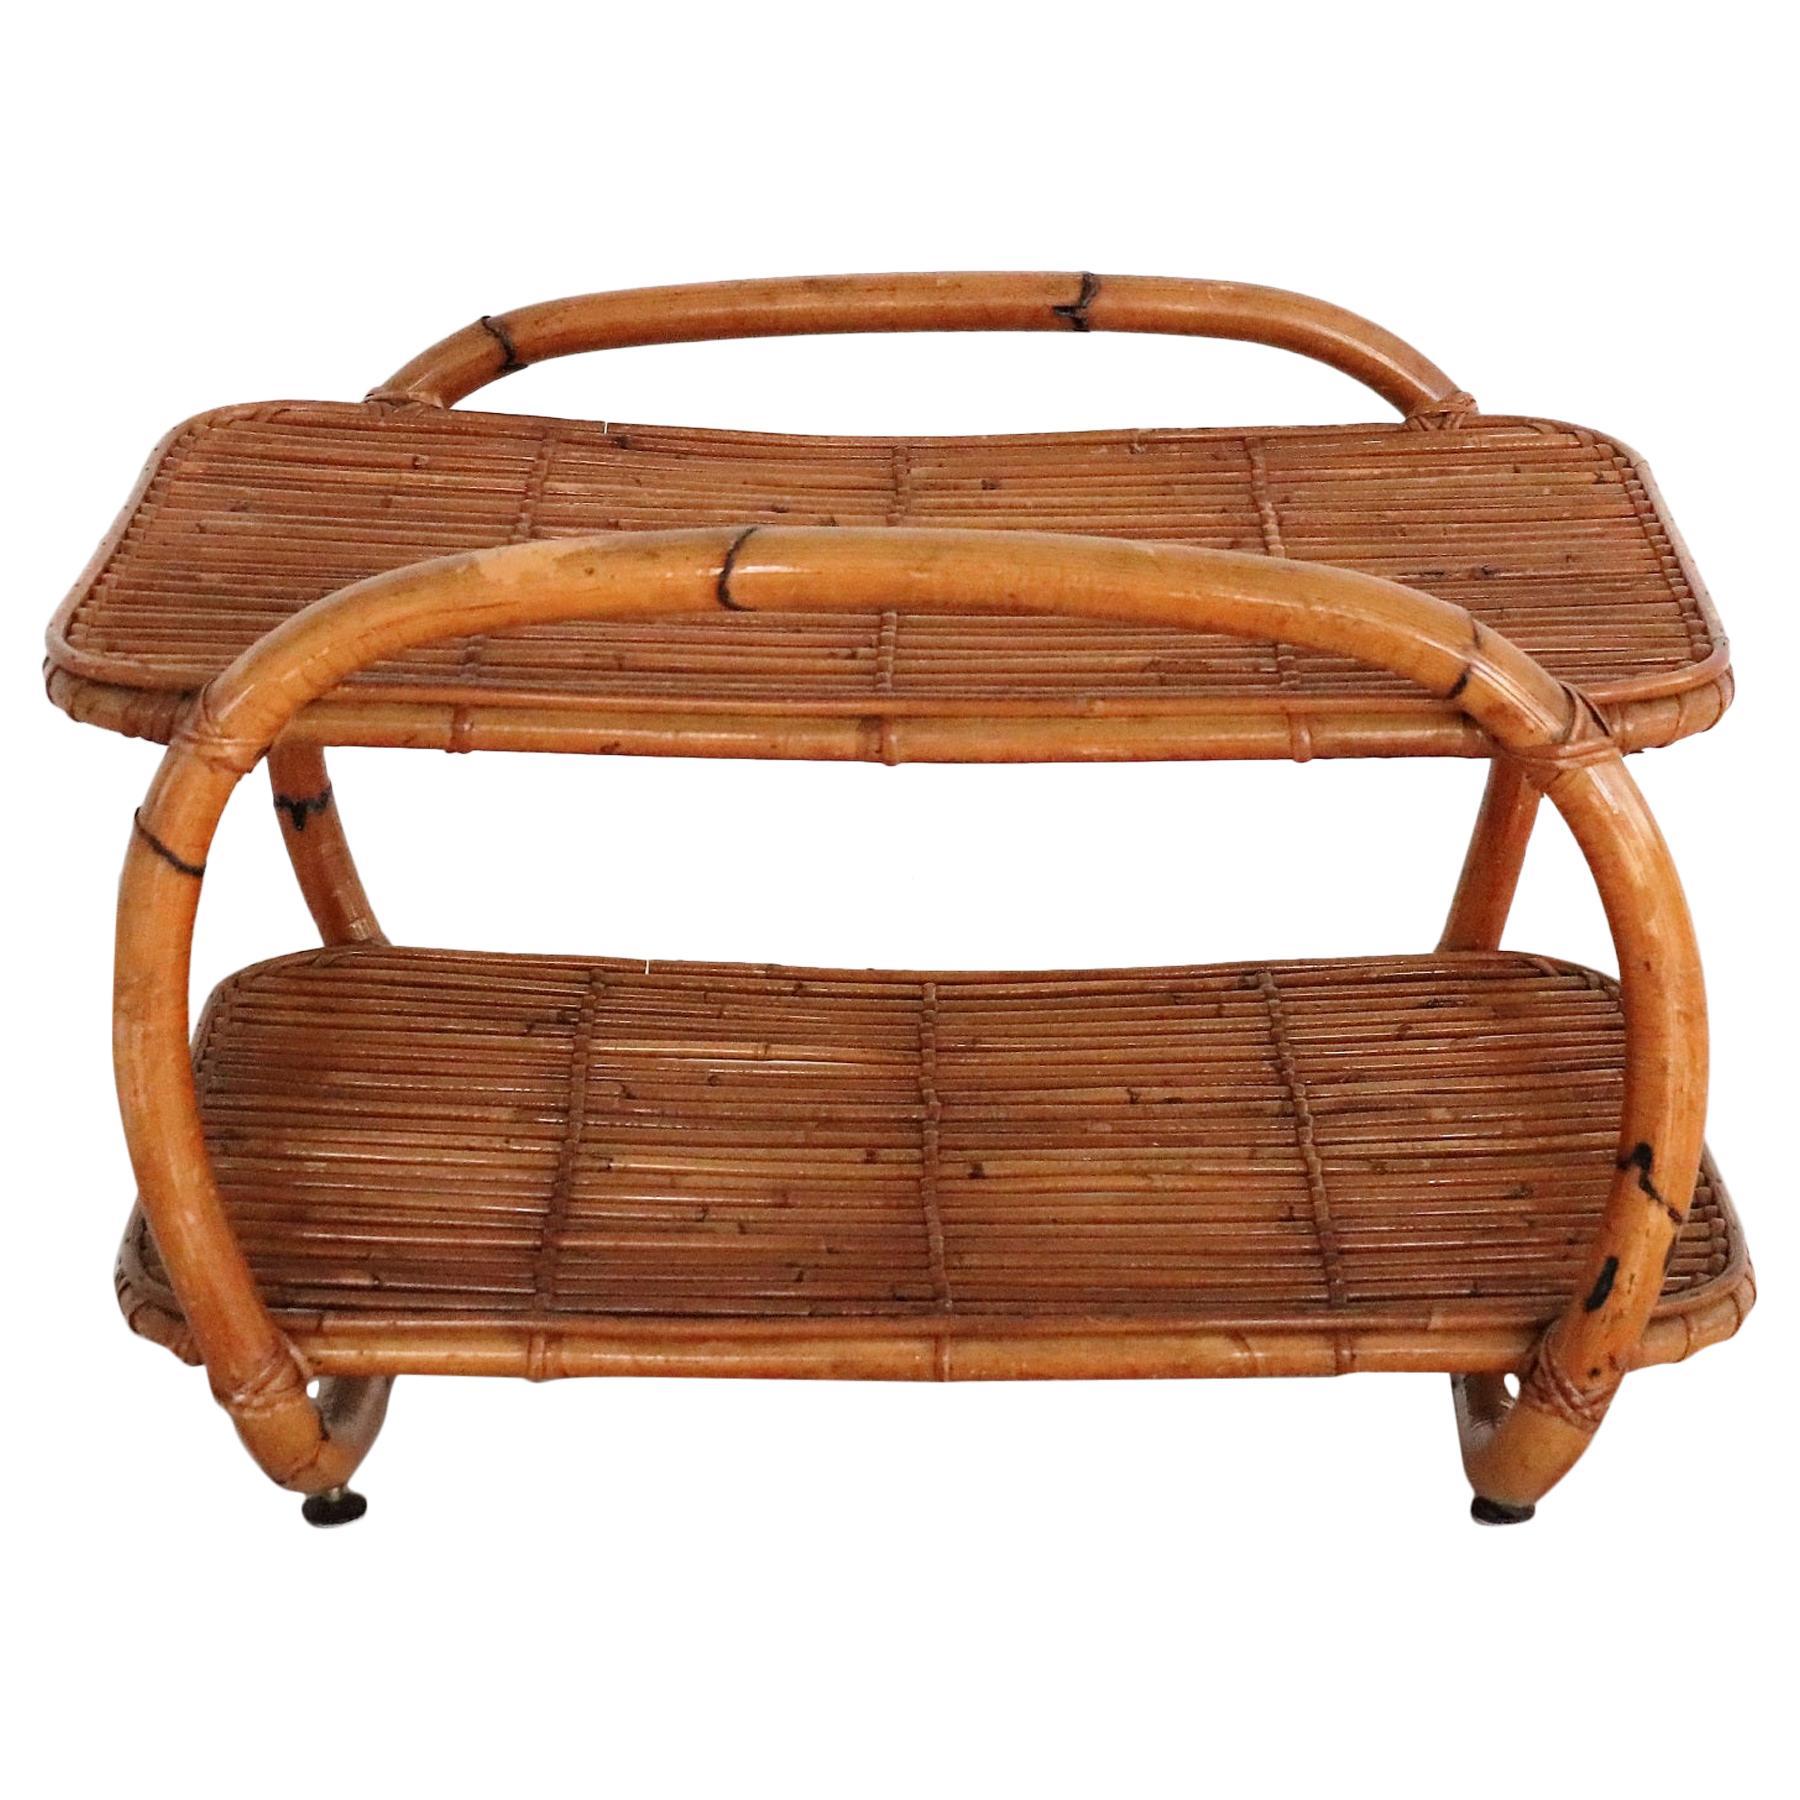 Italian Midcentury Bamboo Shelf in Organic Style, 1970s